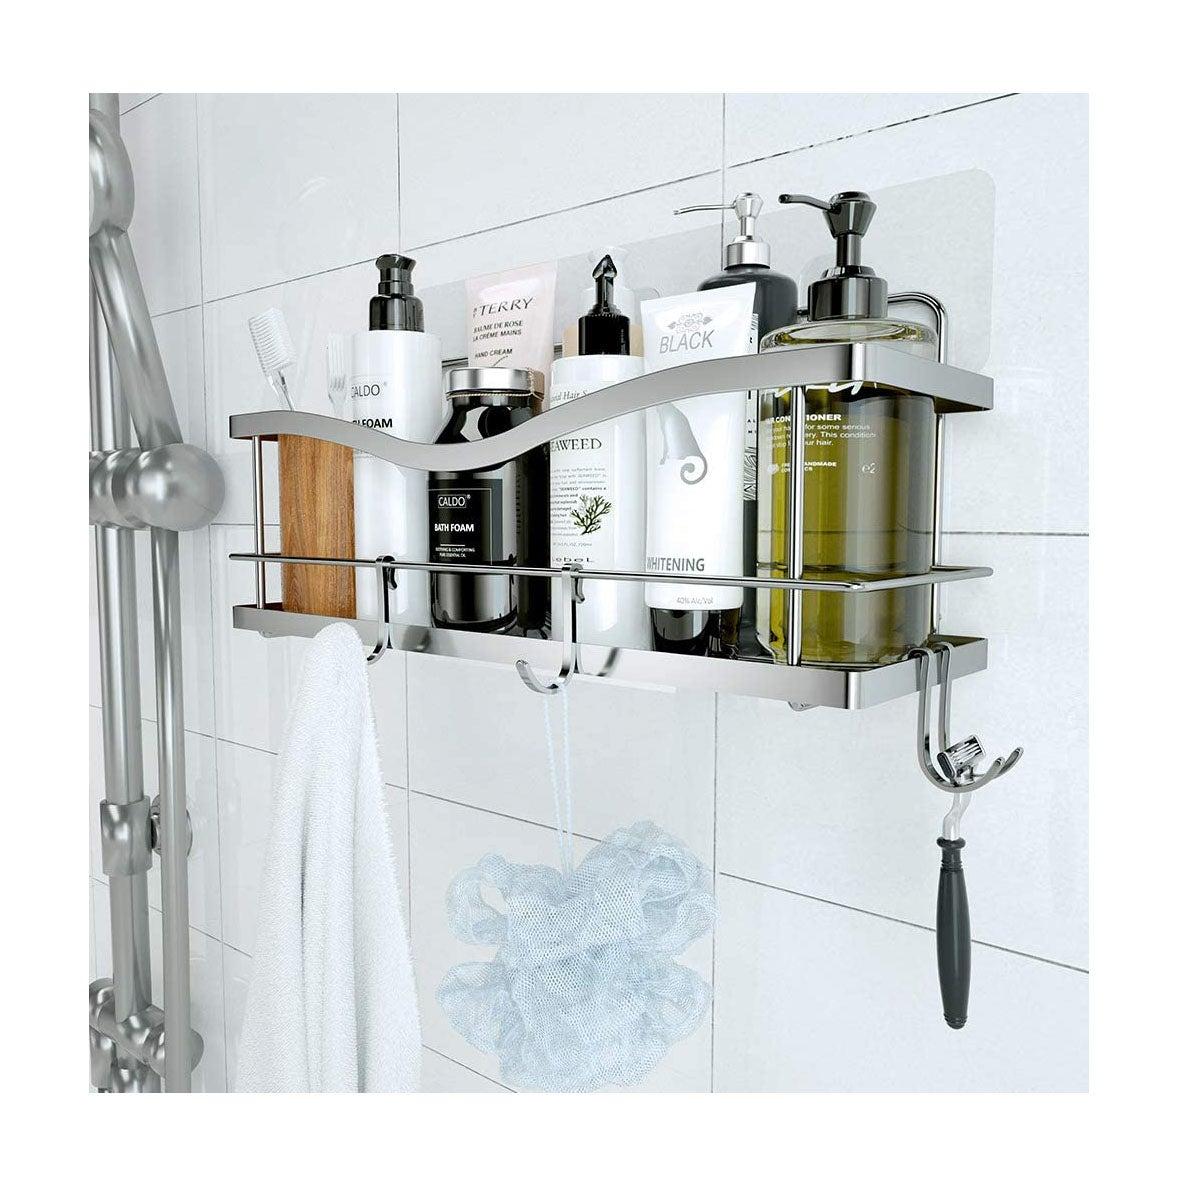 3 Tier Corner Shower Caddy Stainless Steel Shower Corner Bathroom Rack Basket